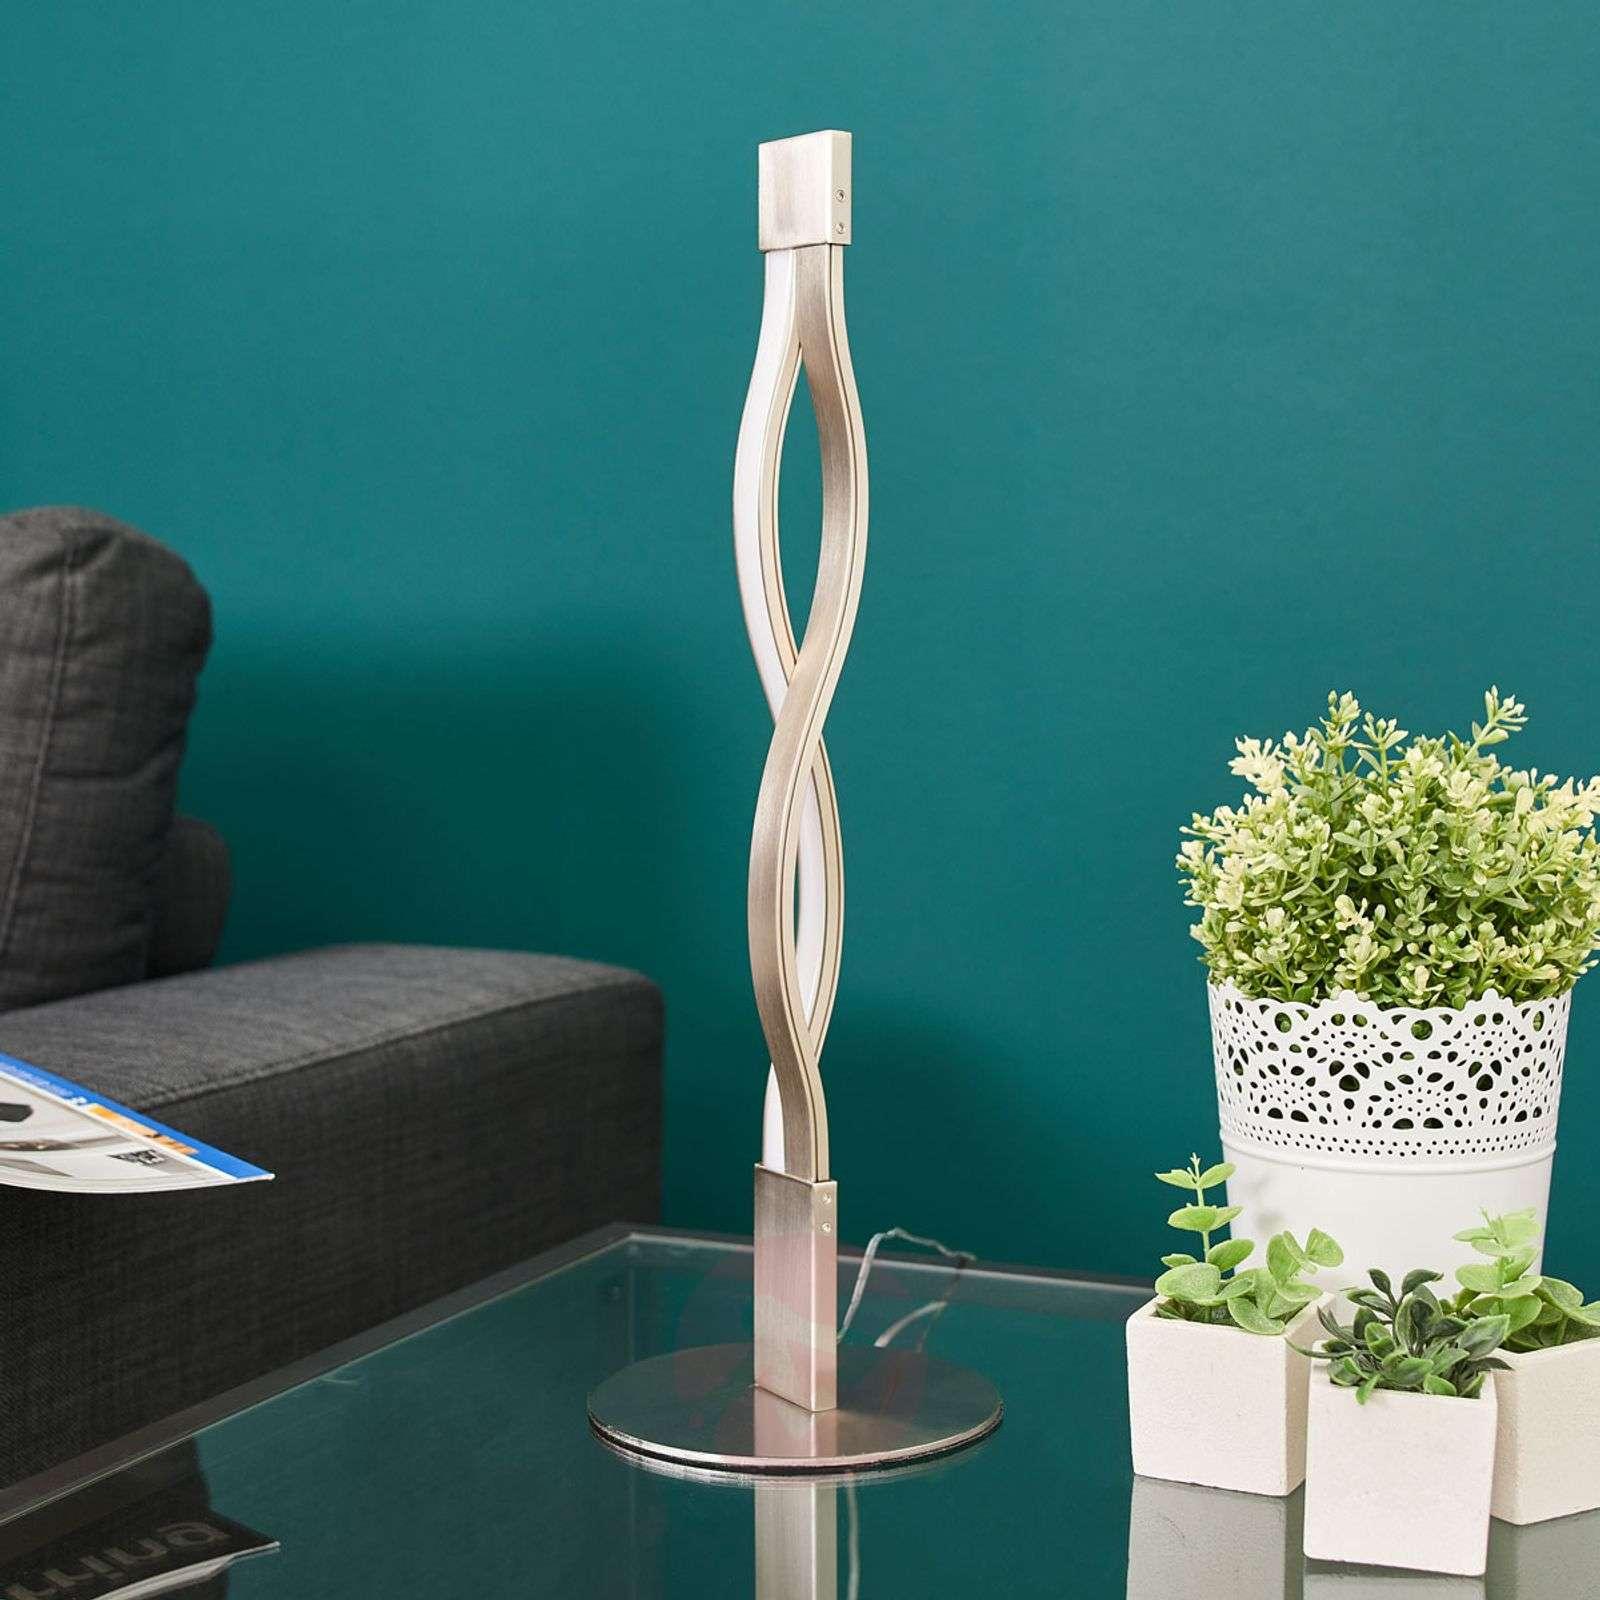 Tori modern looking LED table lamp-9985065-02